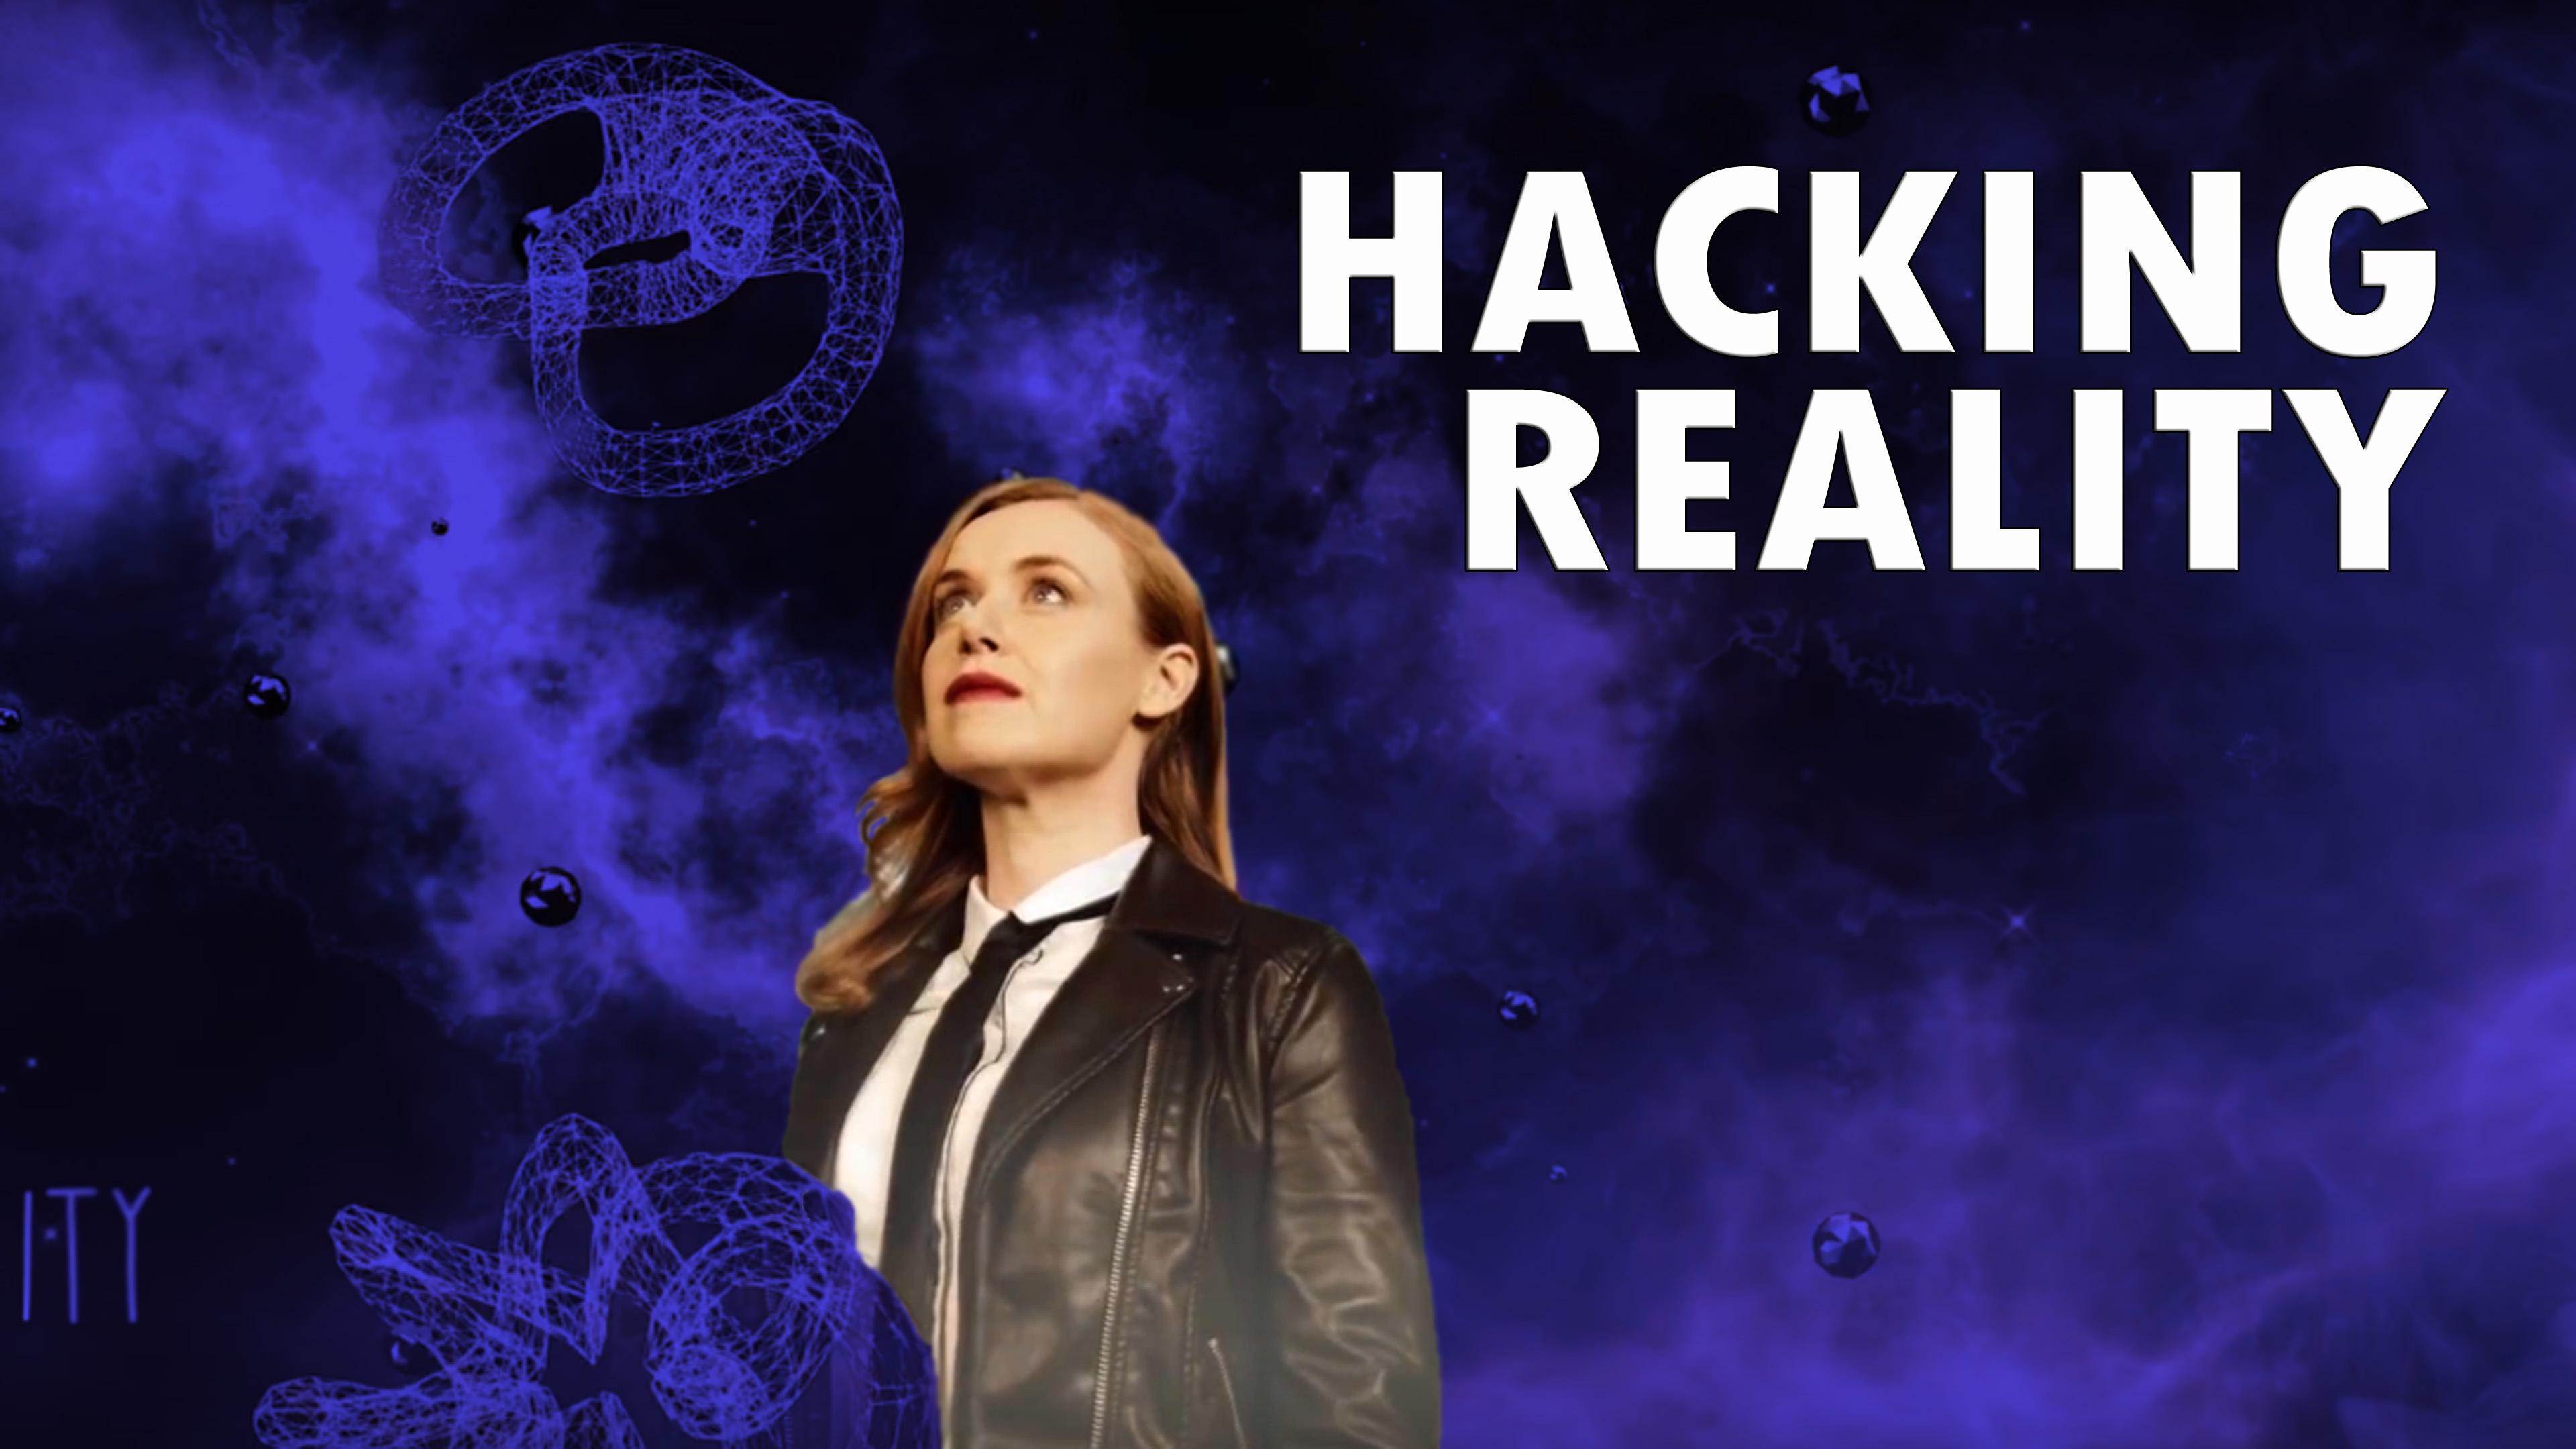 Hacking Reality